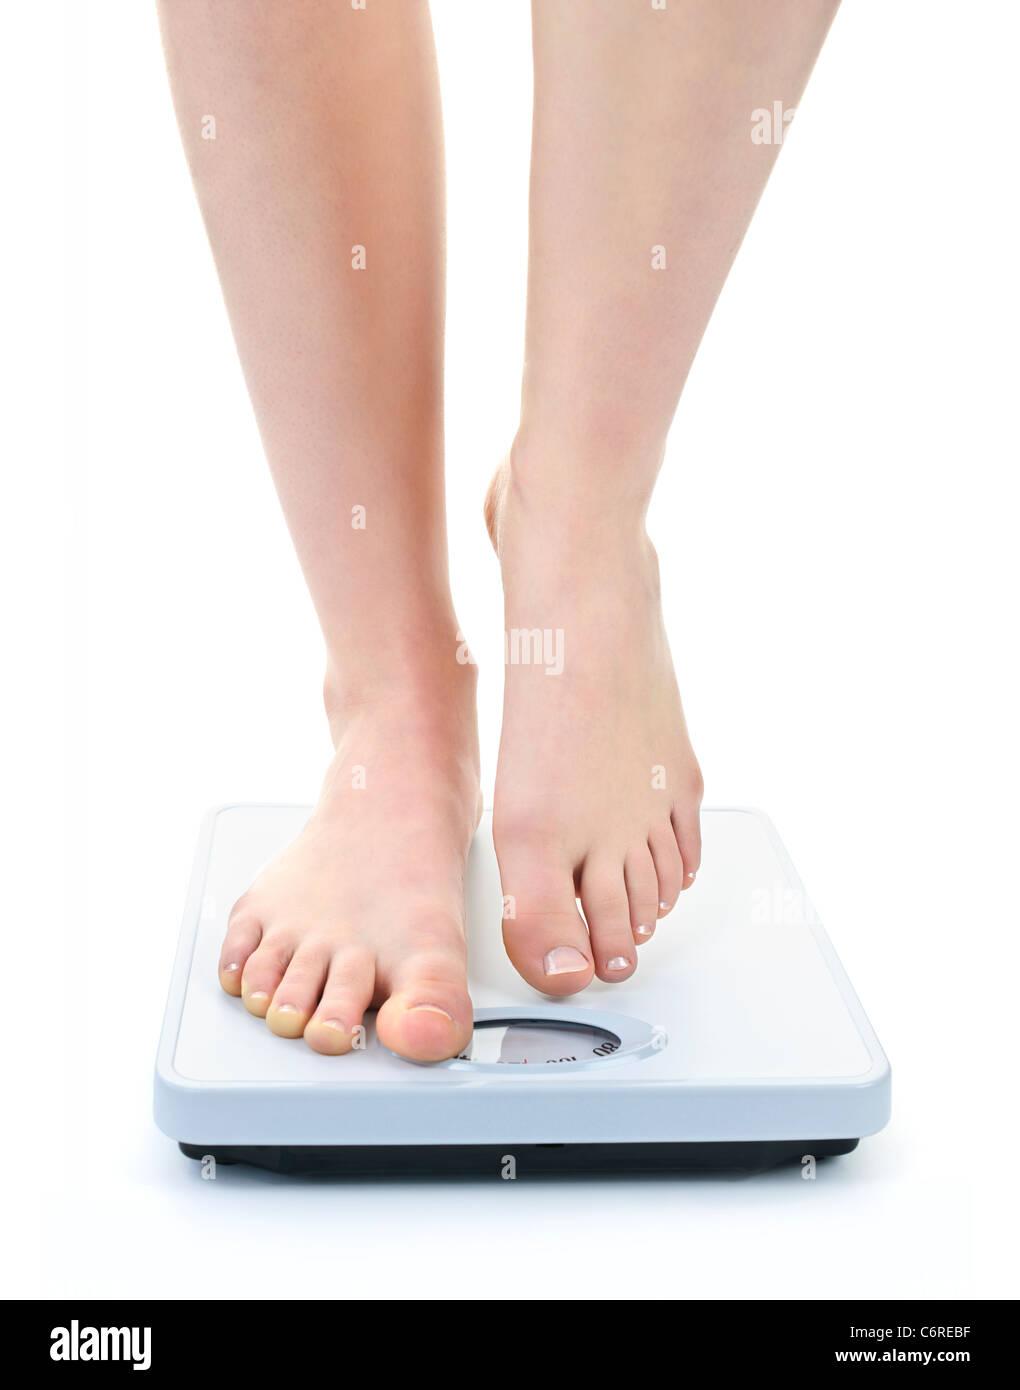 Bare female feet standing on bathroom scale - Stock Image